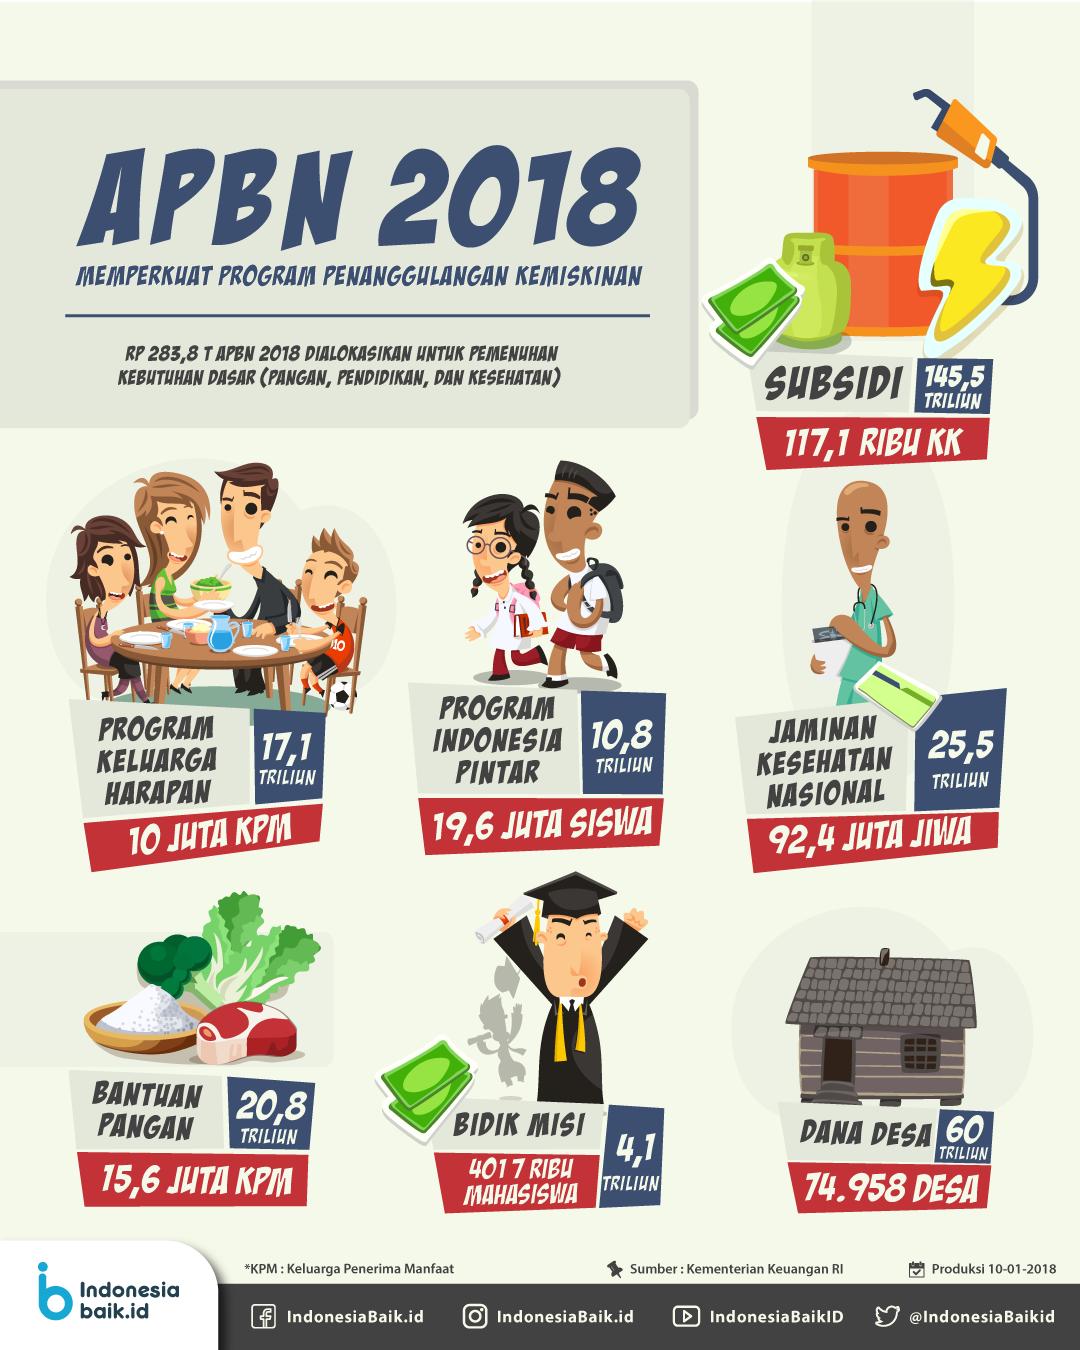 APBN 2018: Memperkuat Program Penanggulangan Kemiskinan